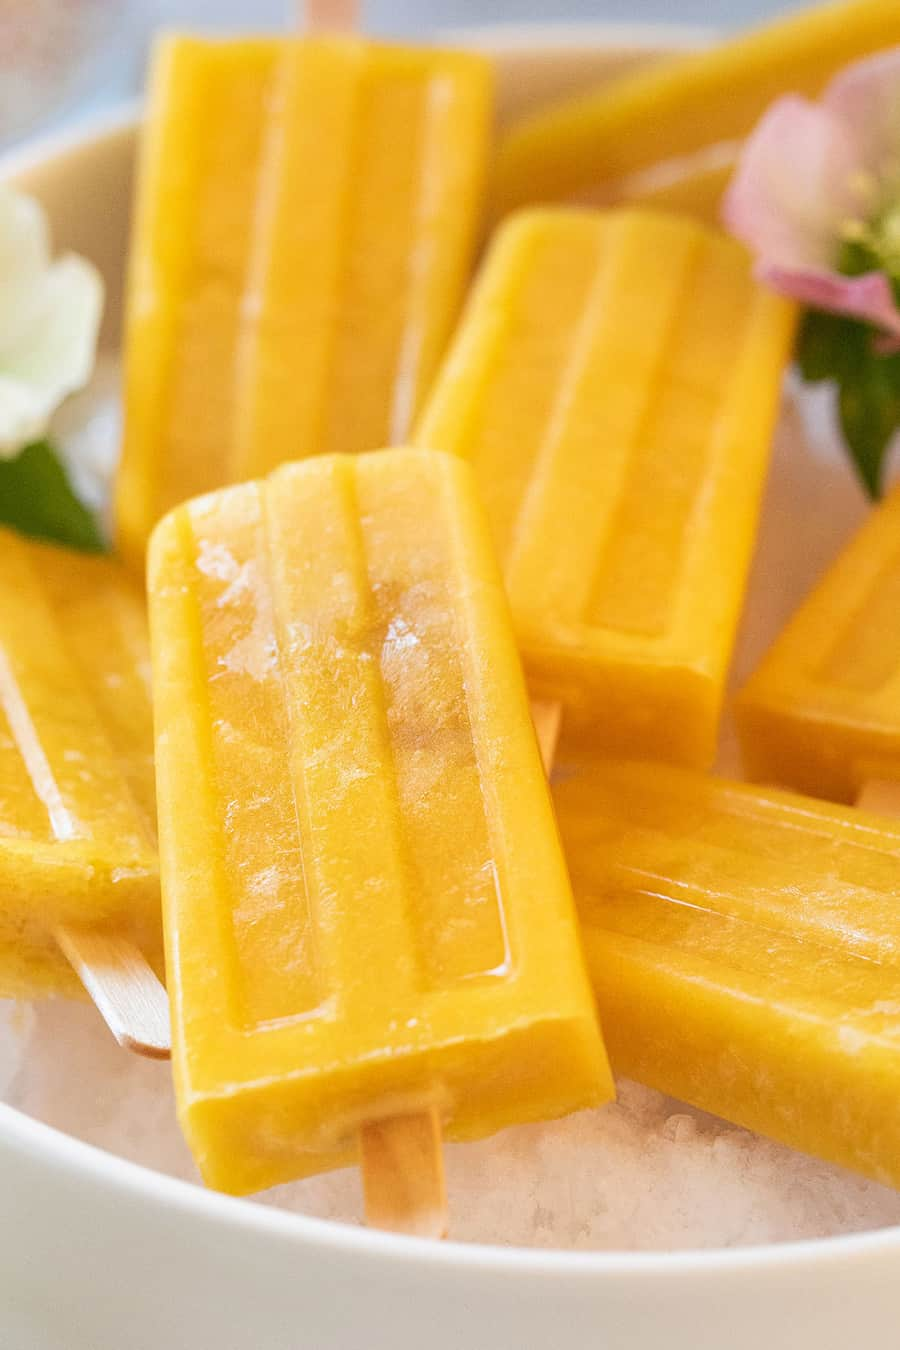 Fruit popsicle recipe